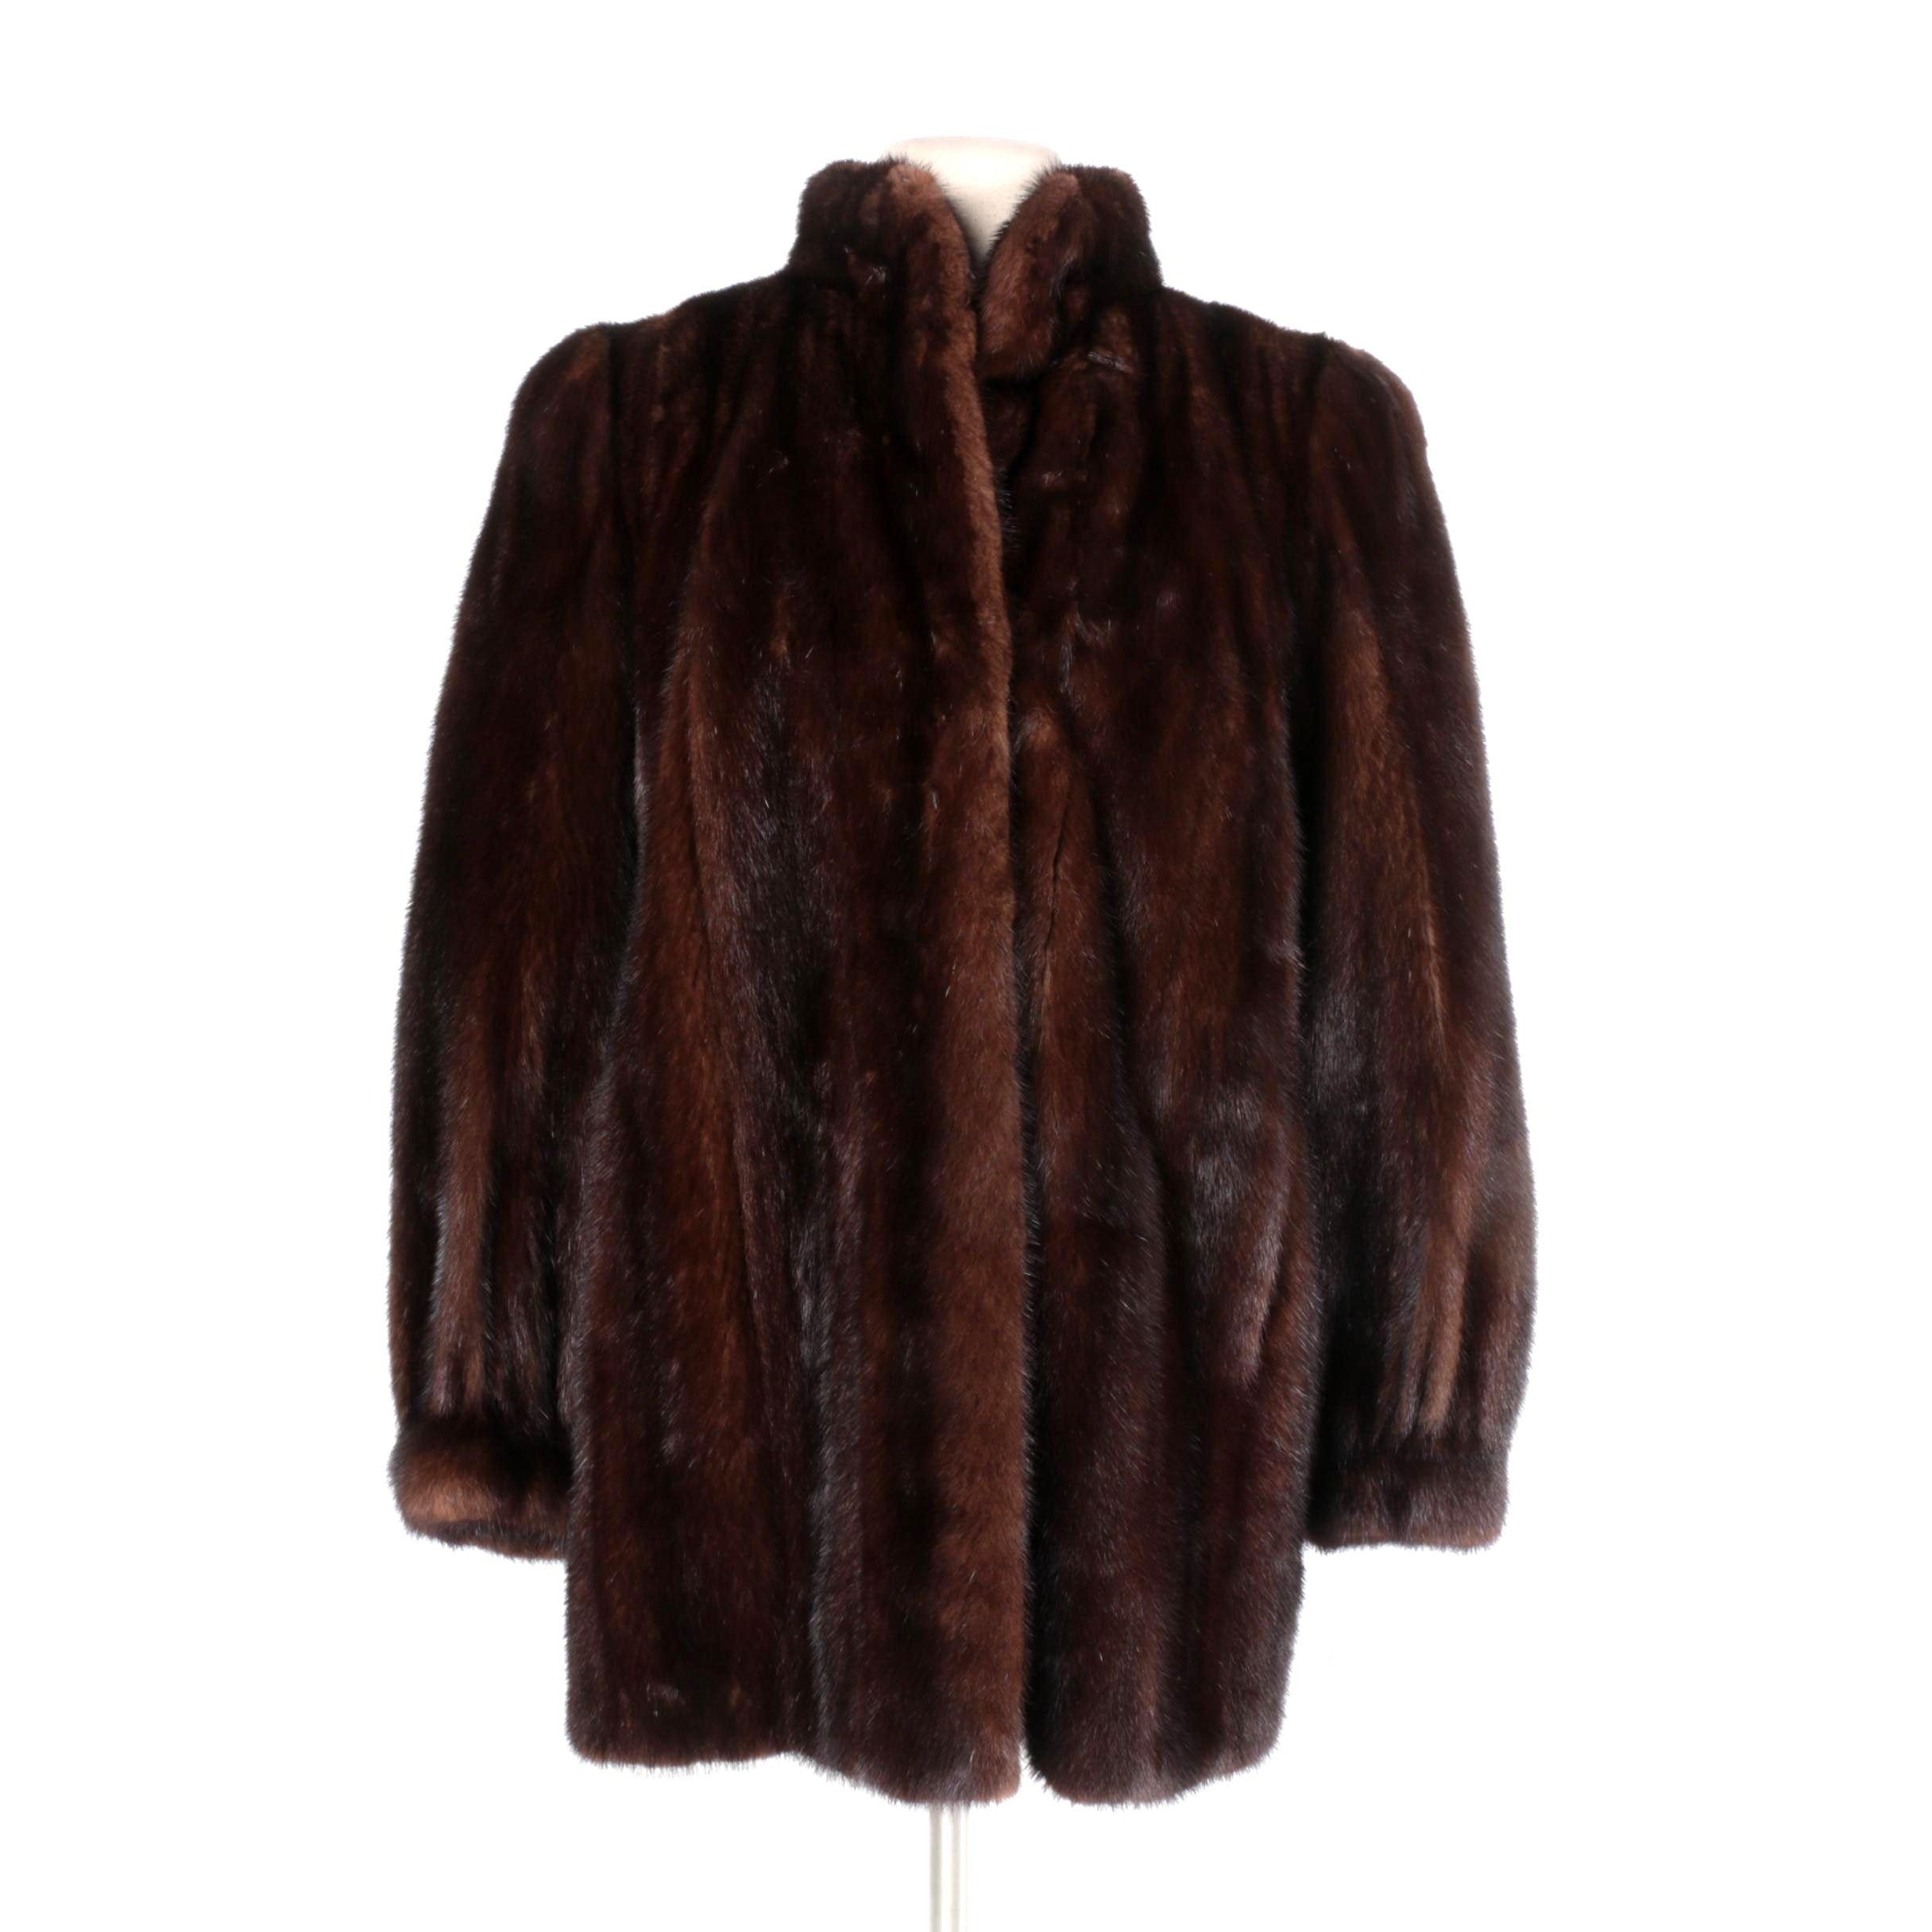 Vintage Christian Dior Fourrure Mink Fur Coat